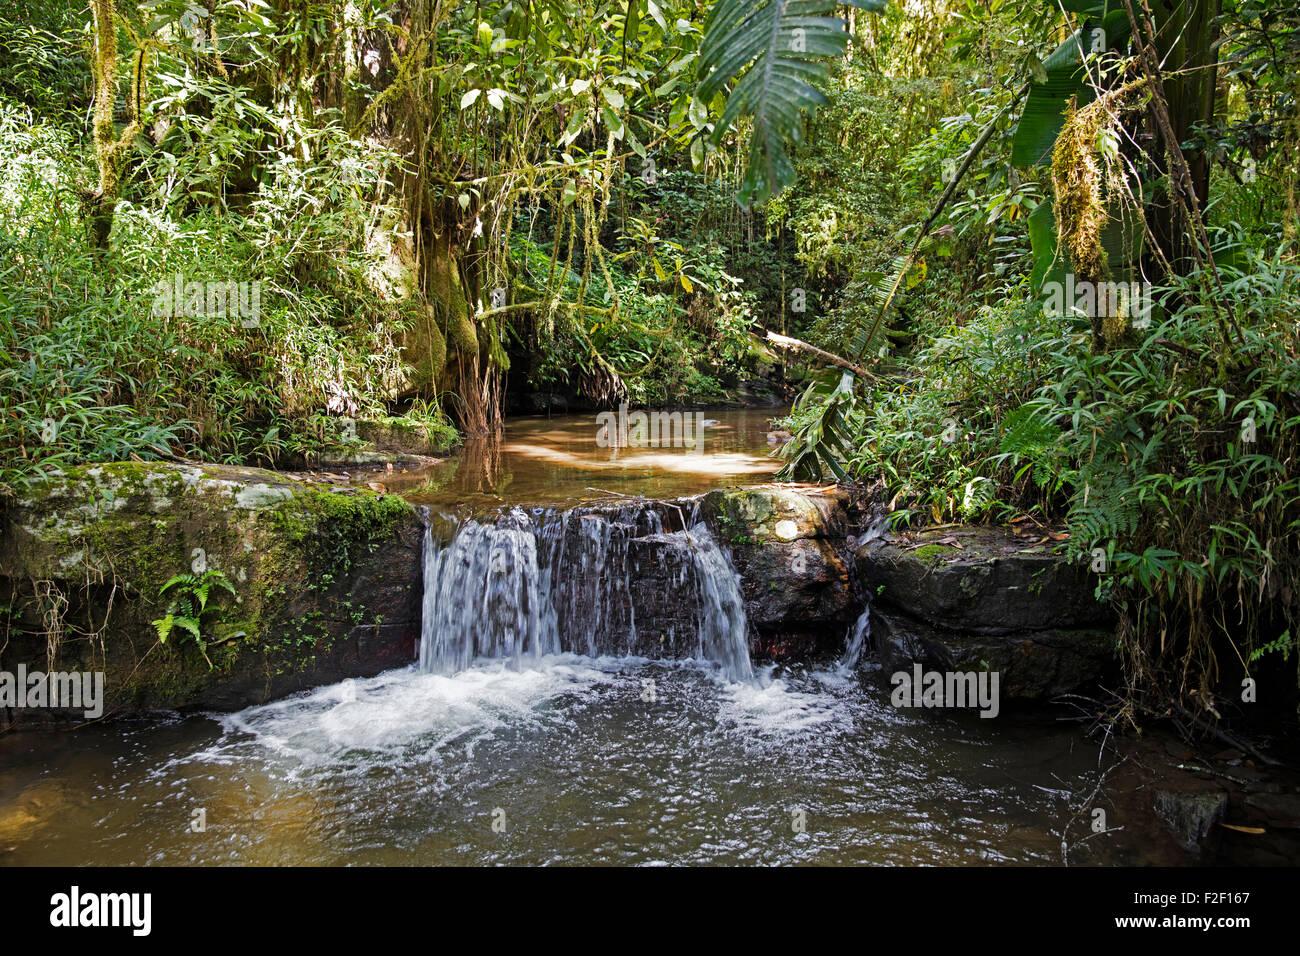 Bach mit Wasserfall im Regenwald der Ranomafana Nationalpark, Haute Matsiatra, Madagaskar, Südostafrika Stockbild